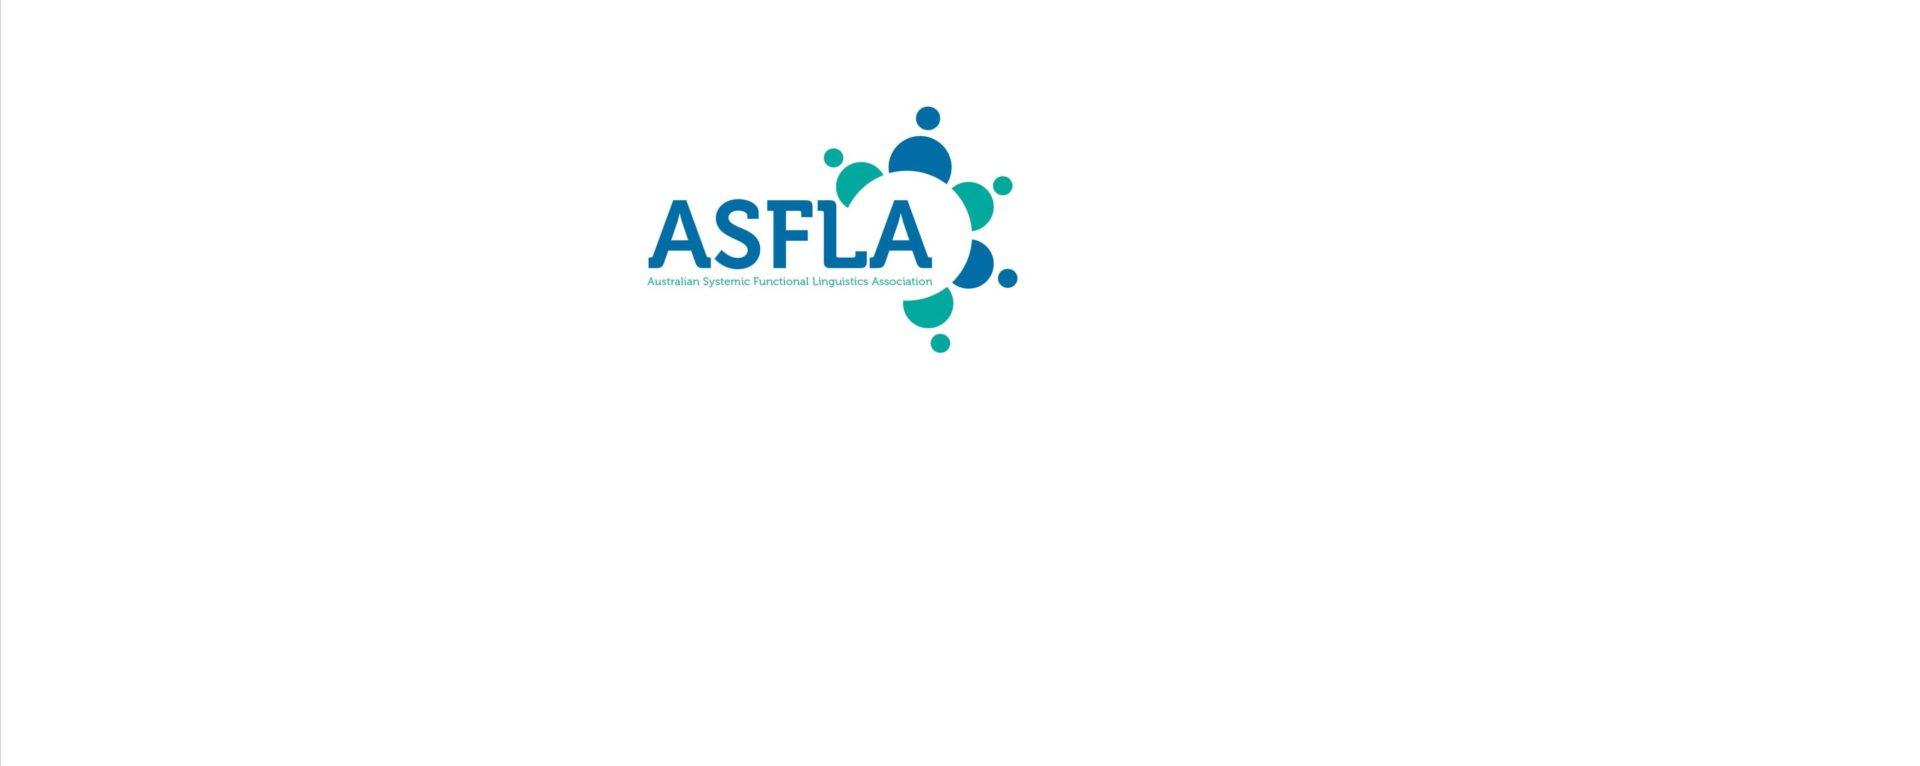 ASFLA - Australian Systemic Functional Linguistics Association